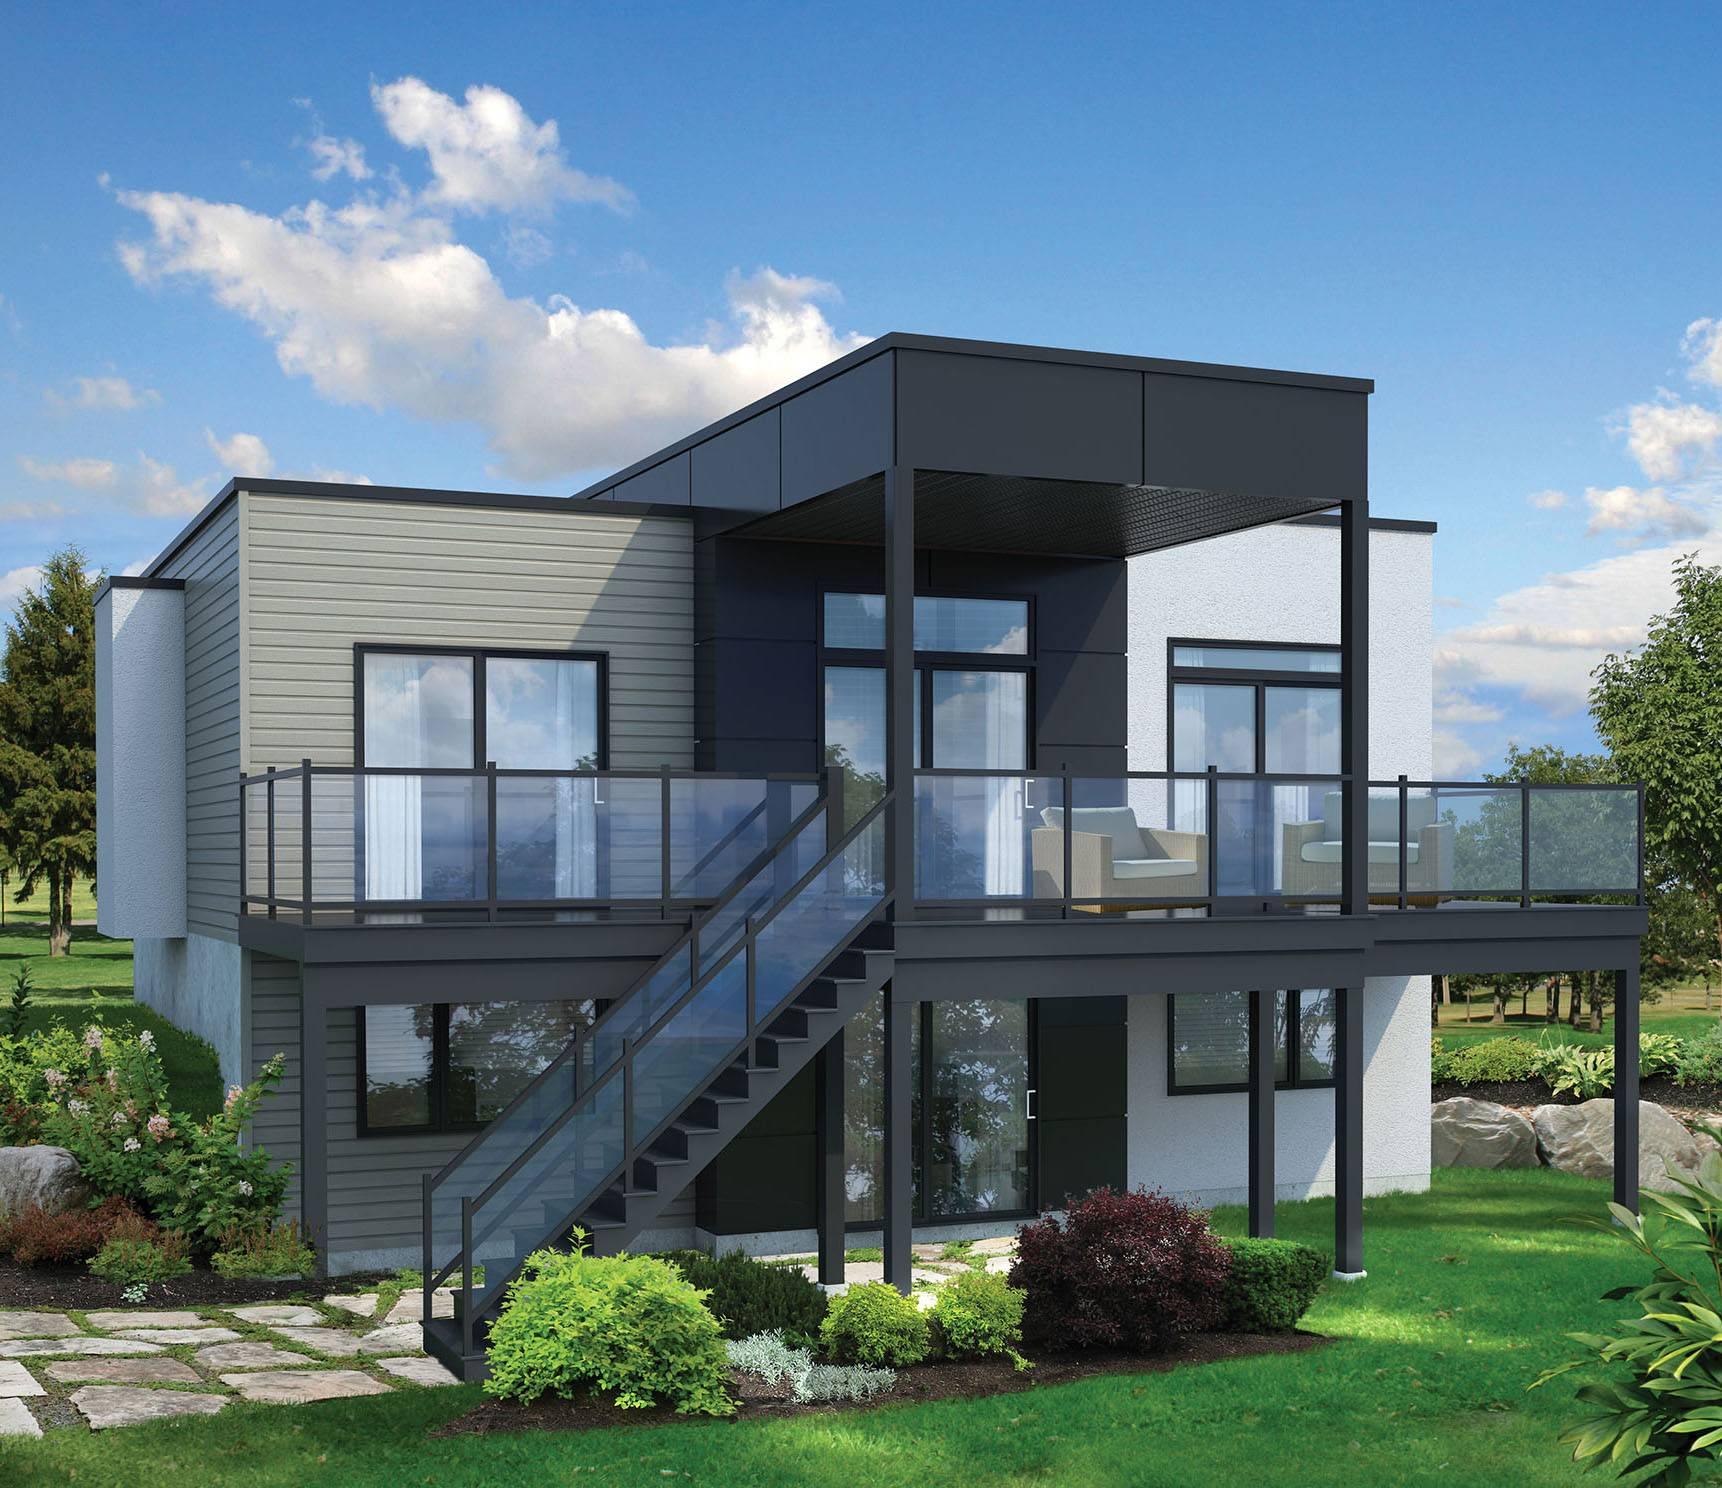 Design Duplex Beach House Plans All House Plans 106848